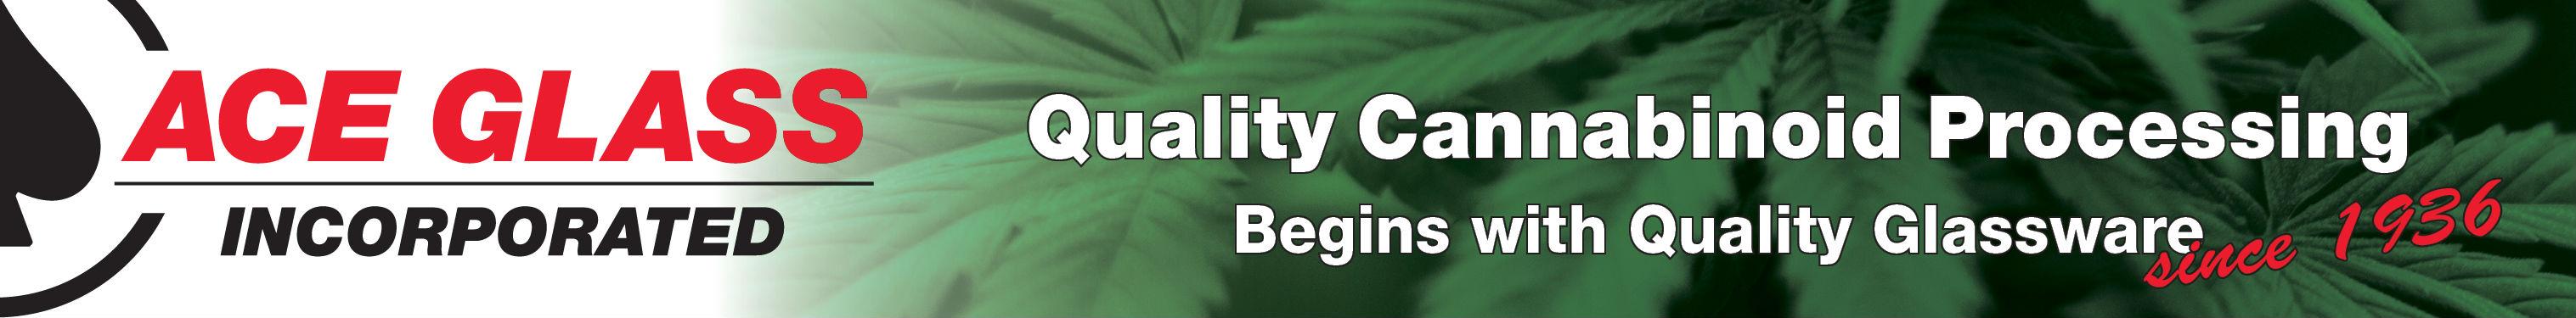 Quality Cannabinoid Processing